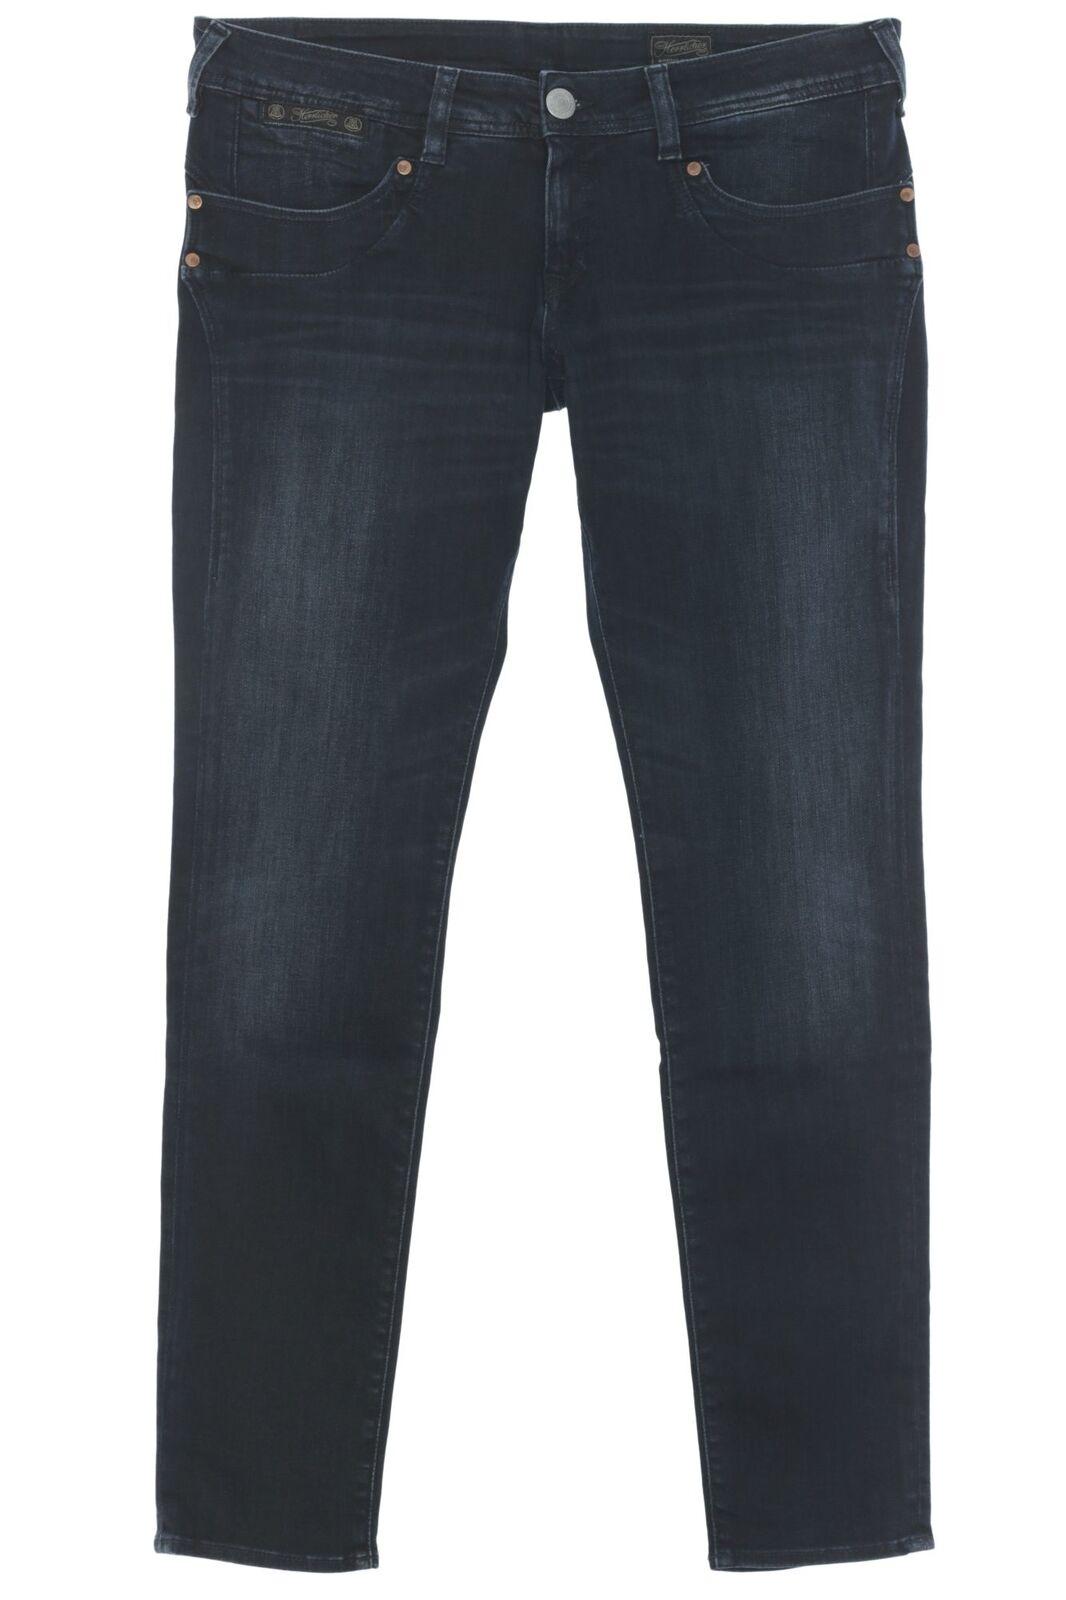 Herrlicher Piper Slim Jeans Hose Pants Damen Used Look Stretch Denim